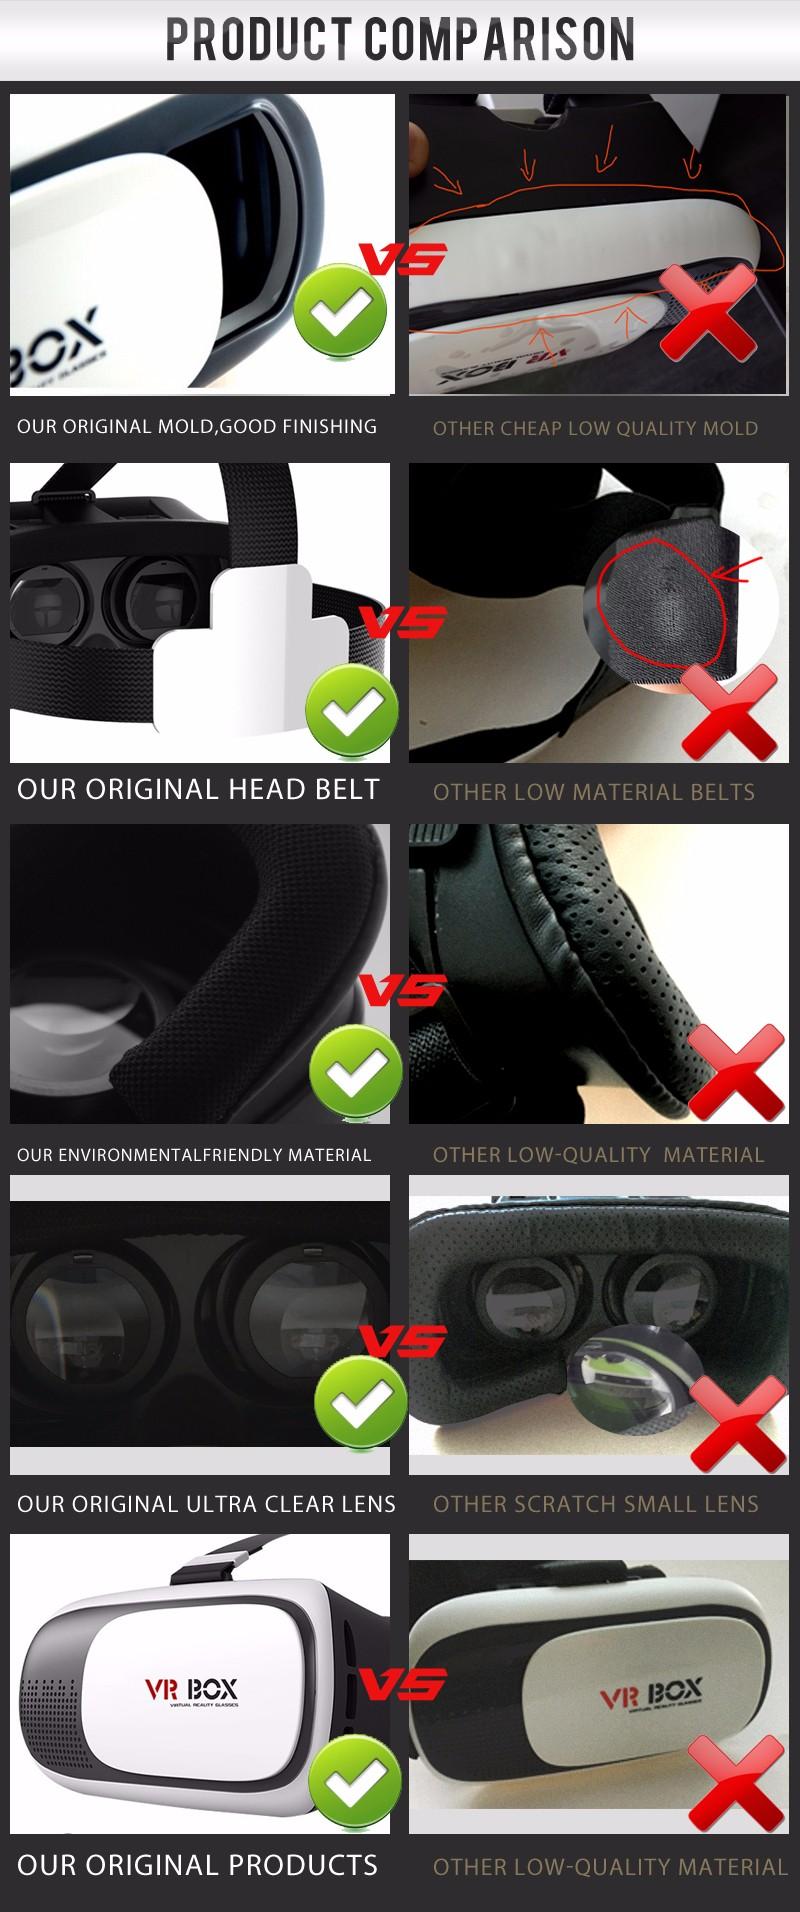 VR BOX ii glasses 2.0